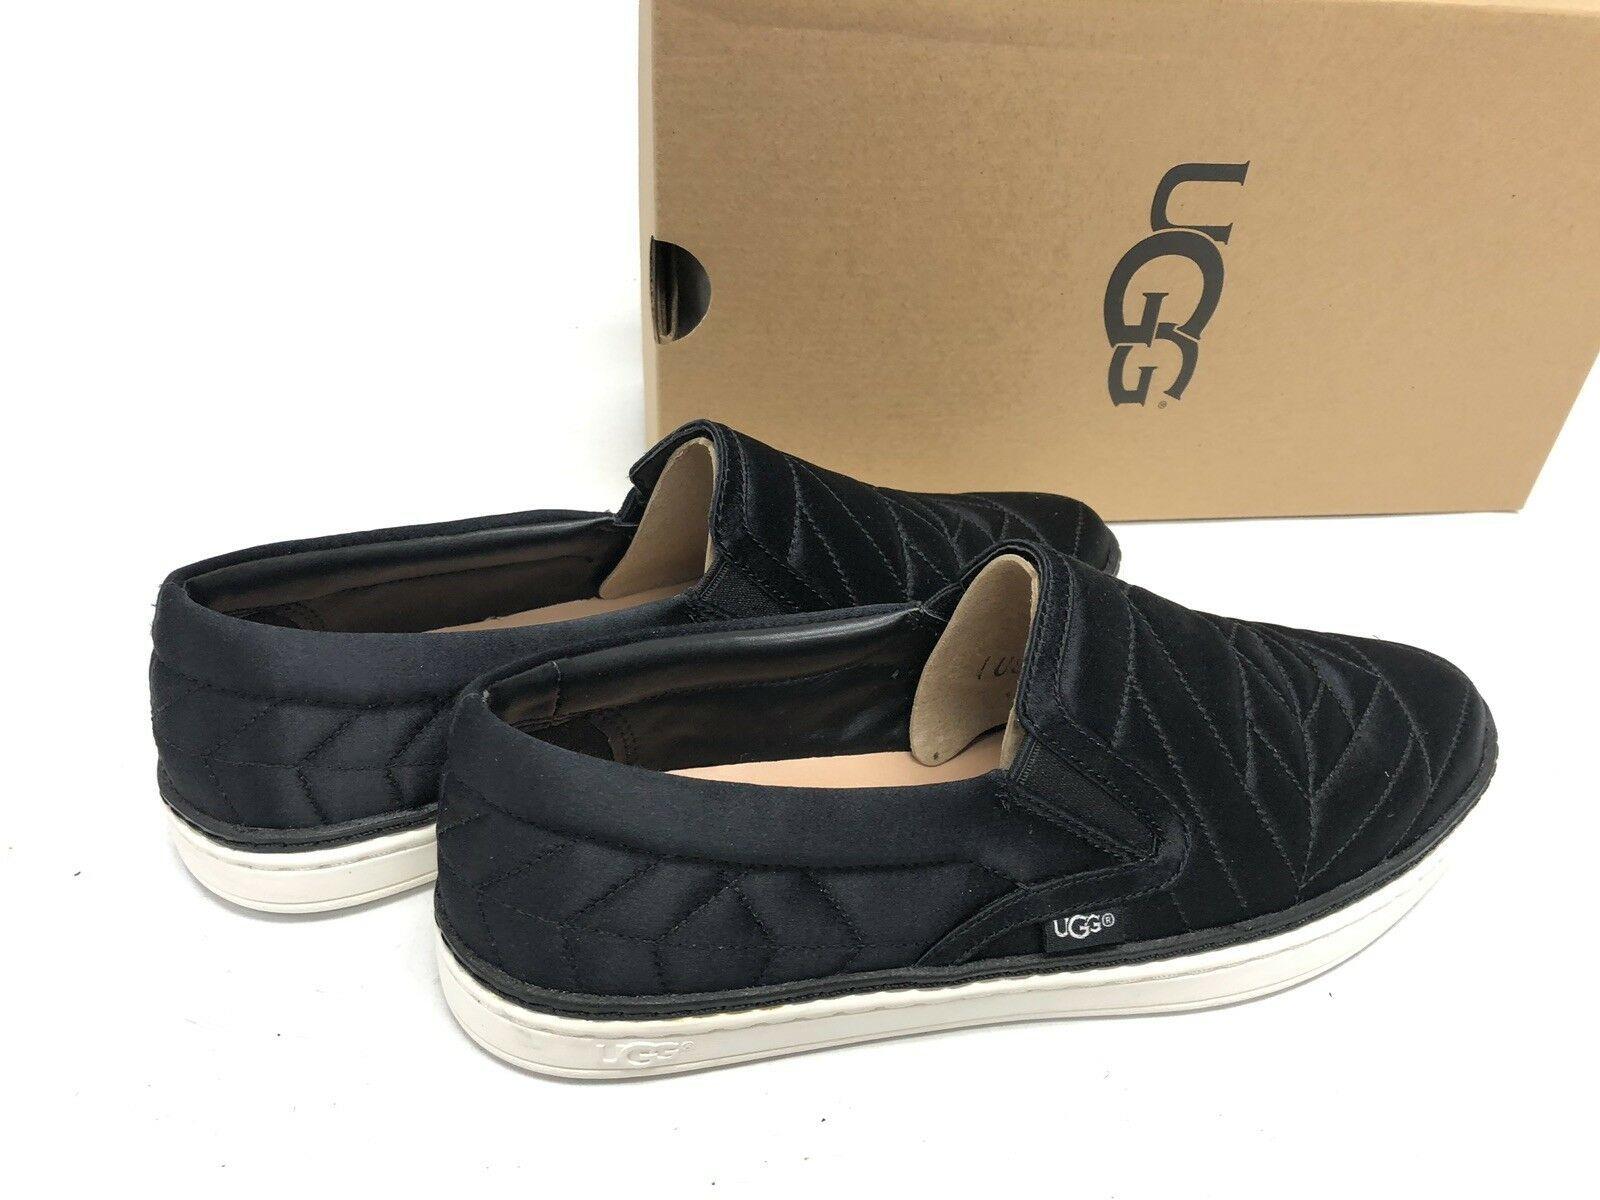 Ugg Australia Soleda Quilted Sneaker Black 1095533 Shoes Women's Slip On